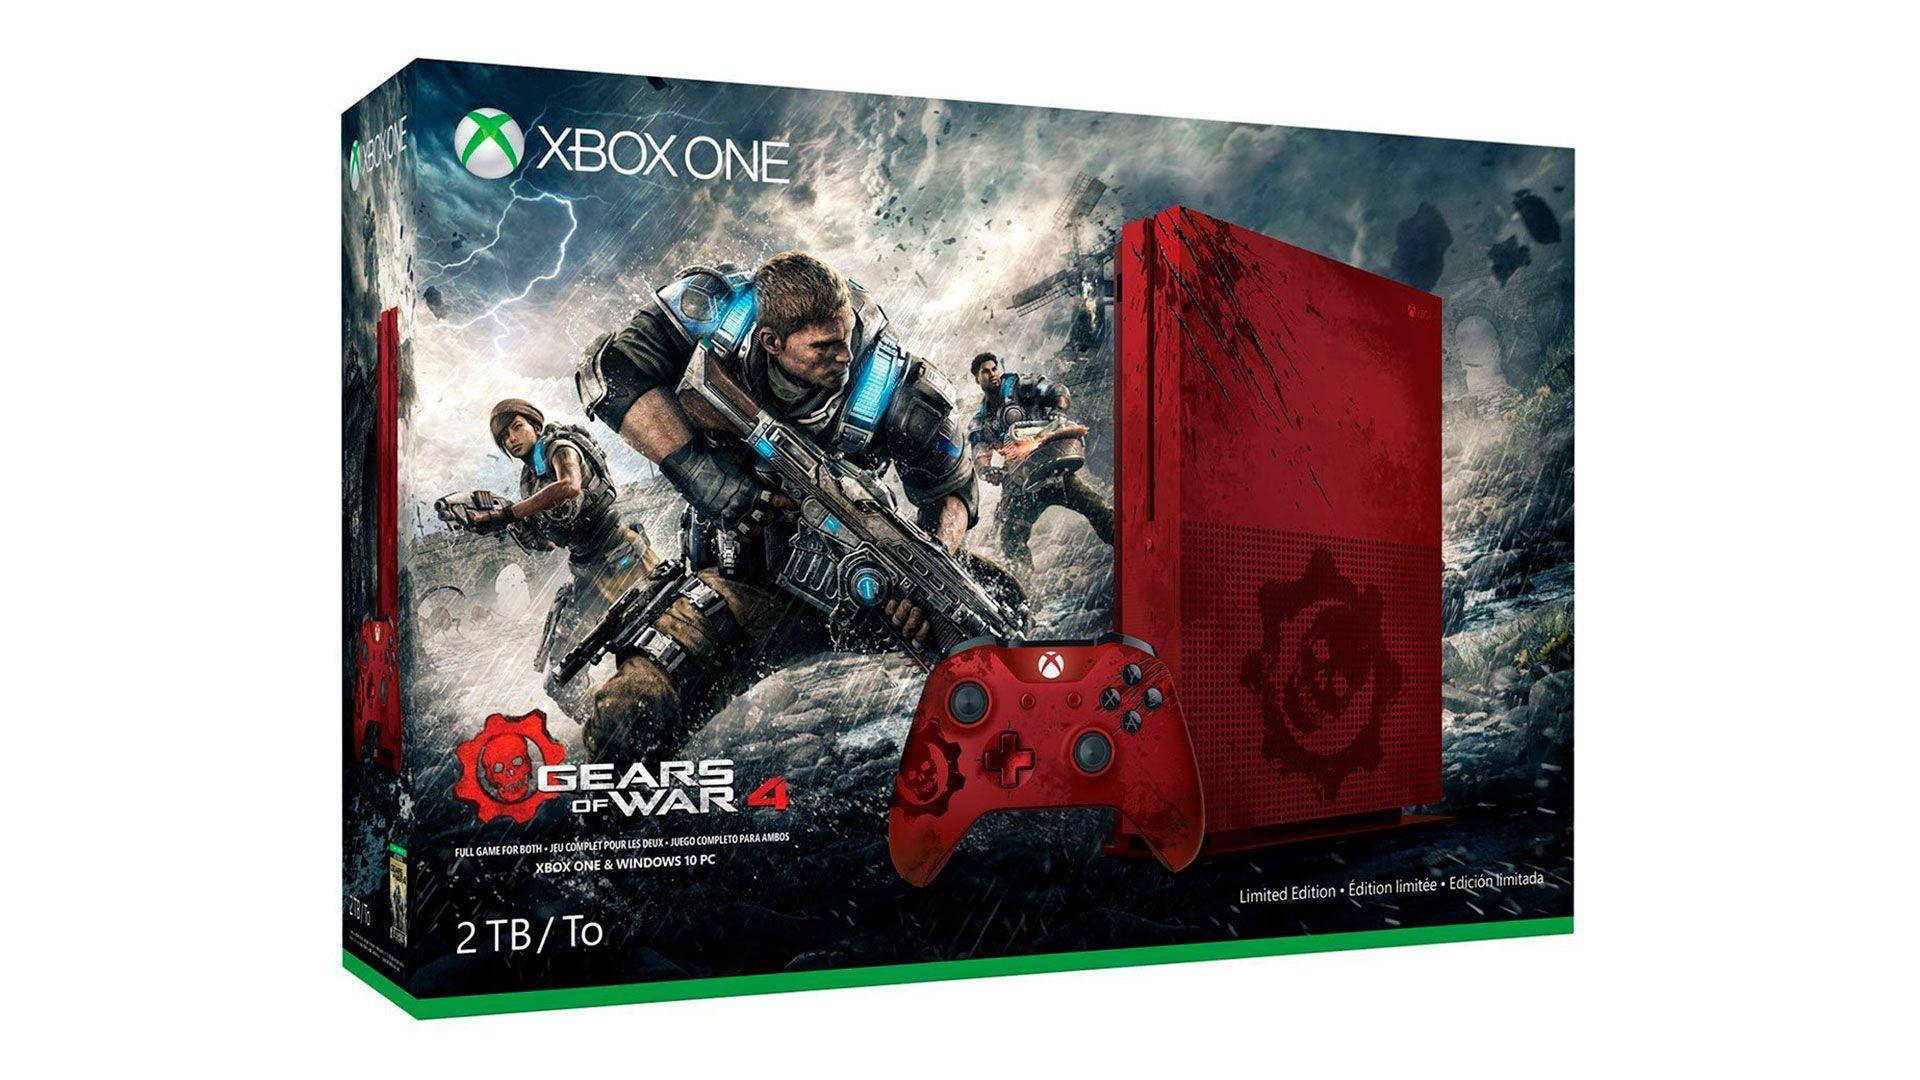 Xbox One S 2Tb Gears of War 4 приставка лимитированной серии [SXO2GWR]